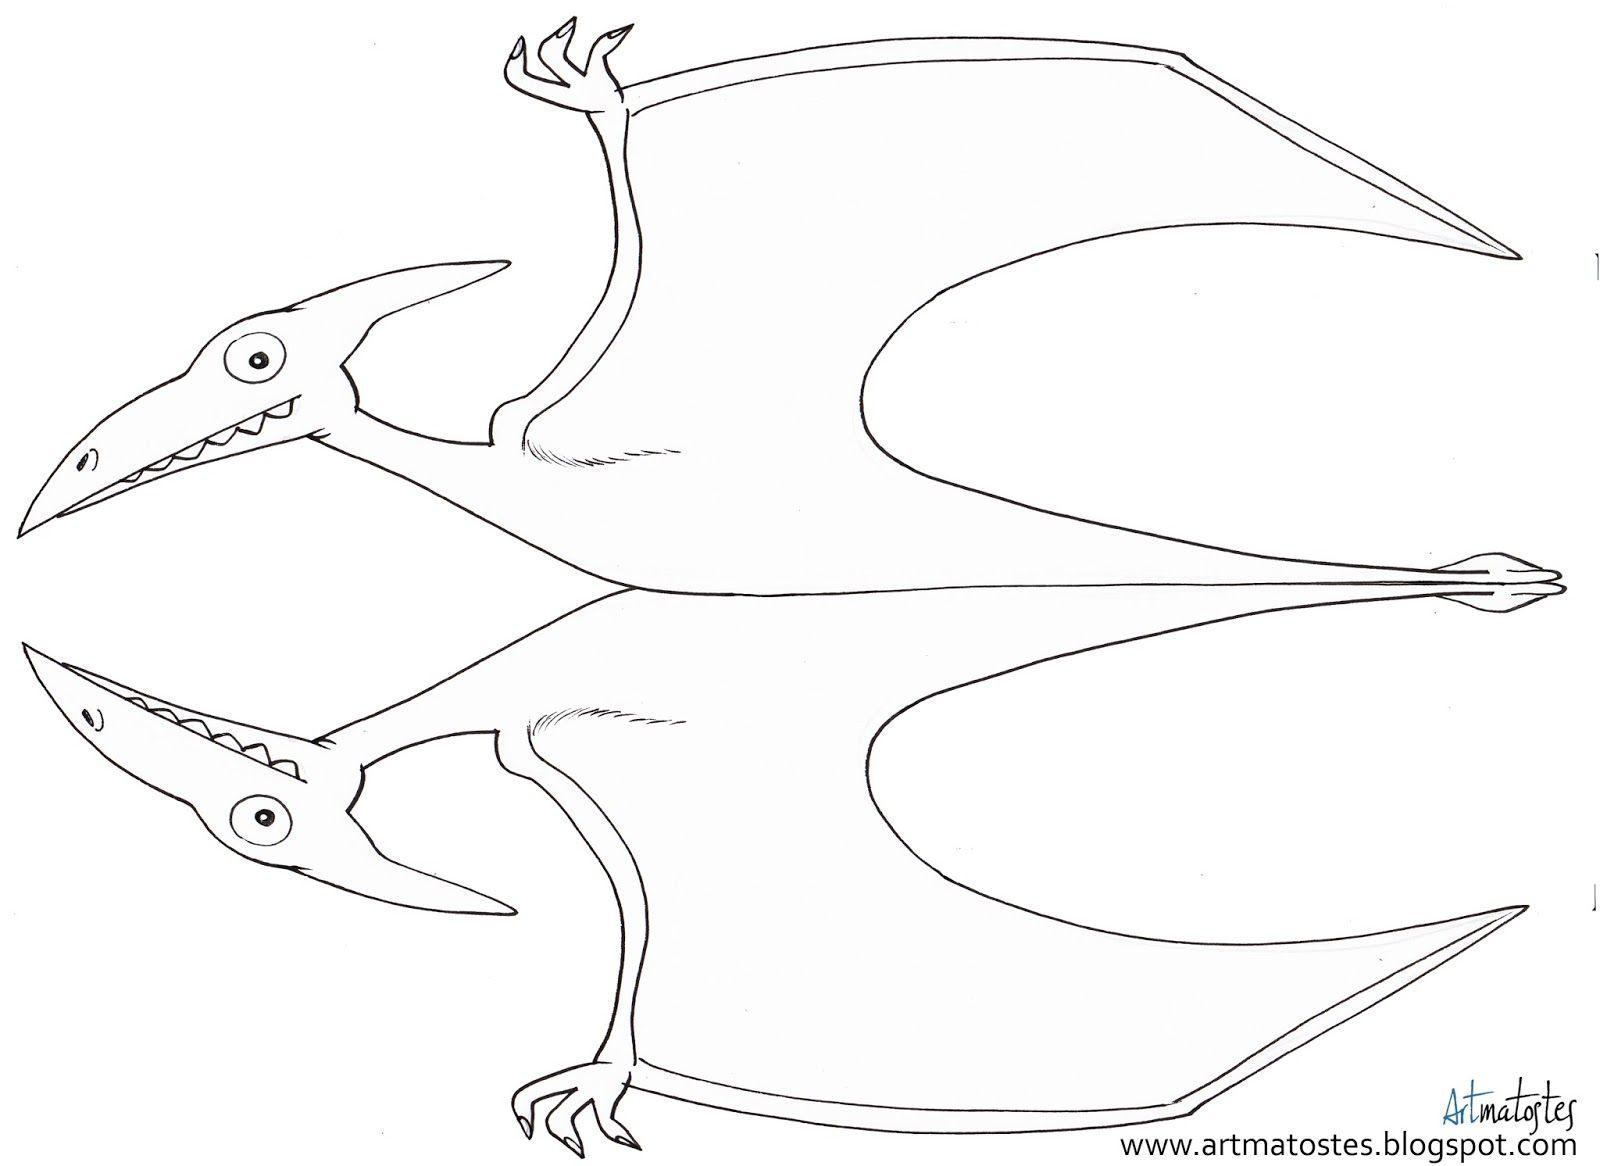 Ausmalbilder Dinosaurier Skelett : Artmatostes Dinosaurios Pinterest Dinosaurier